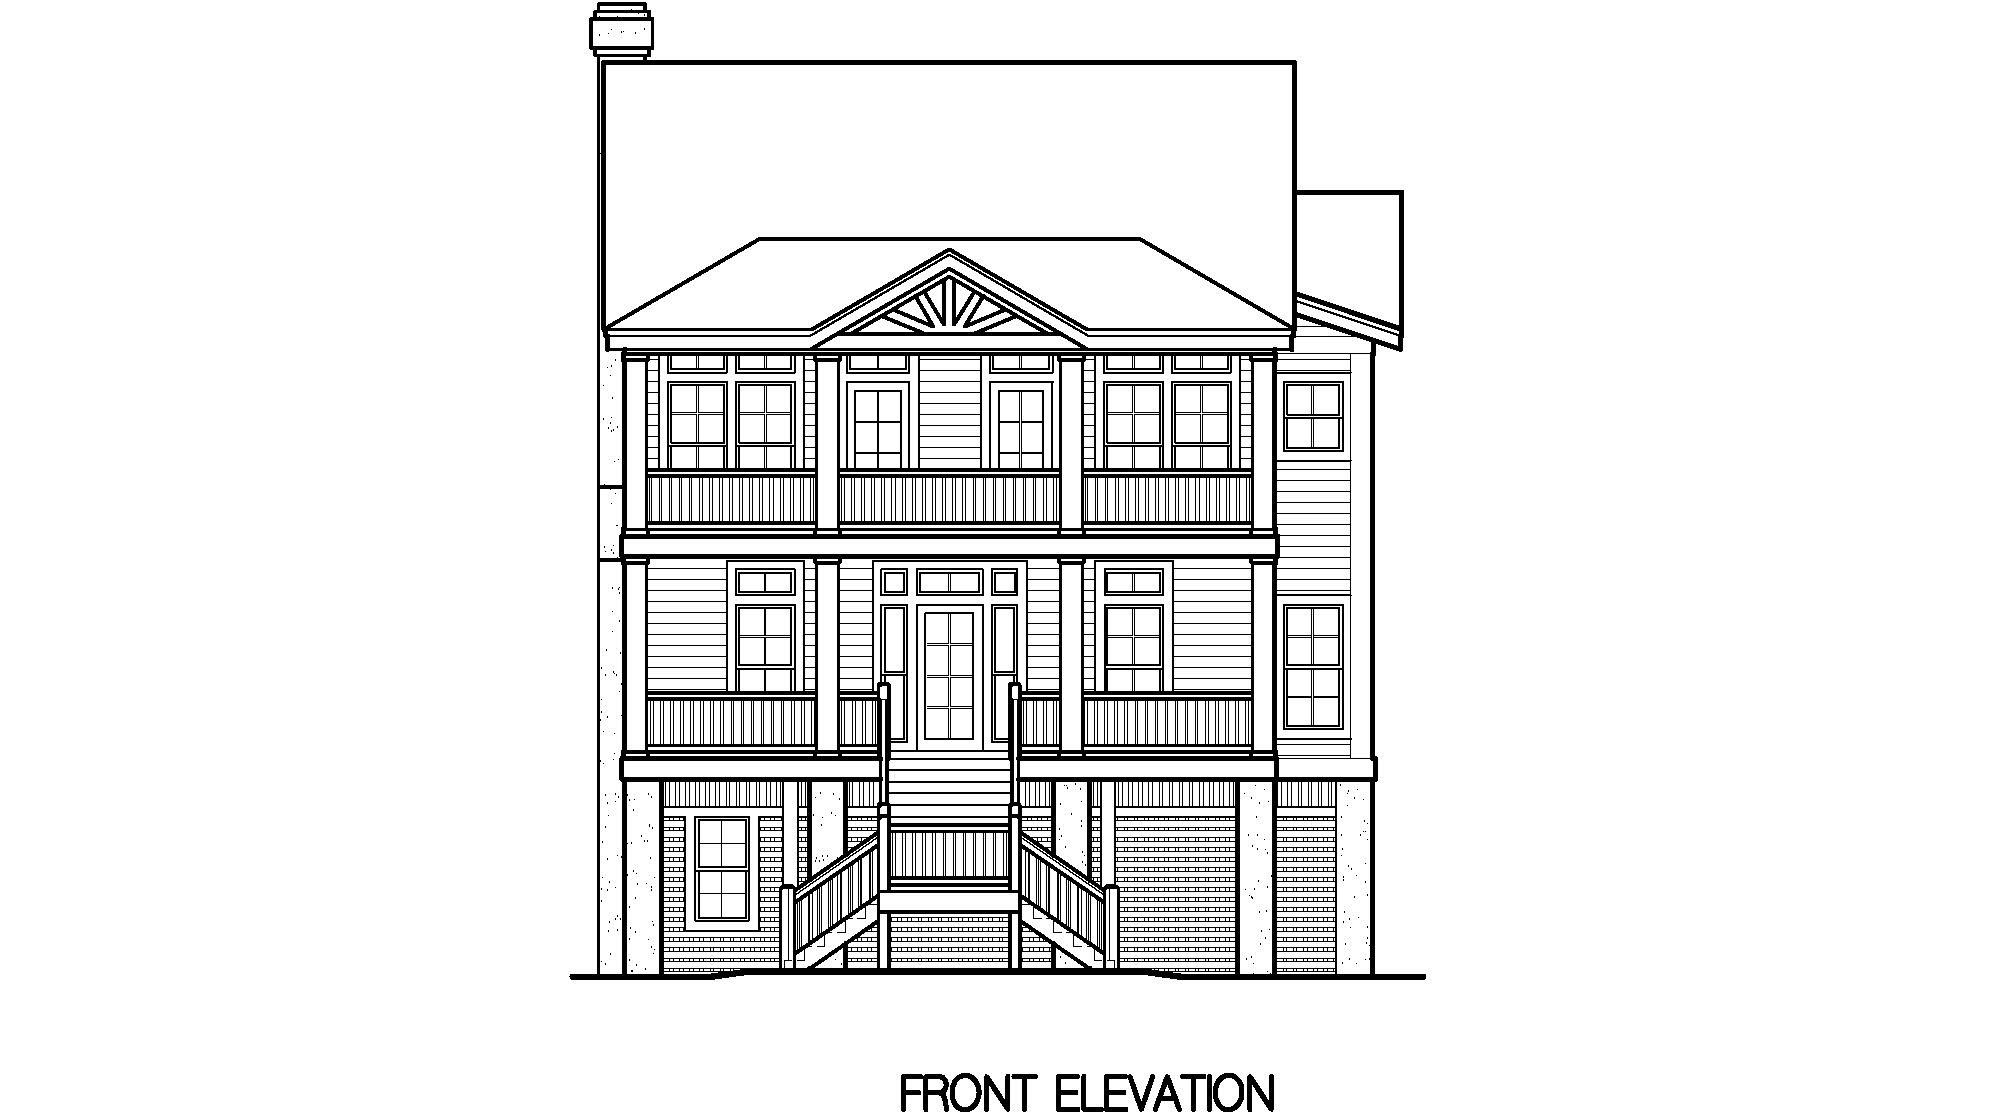 Front Elevation Side Elevation : Porches cottage standard piling foundation with side